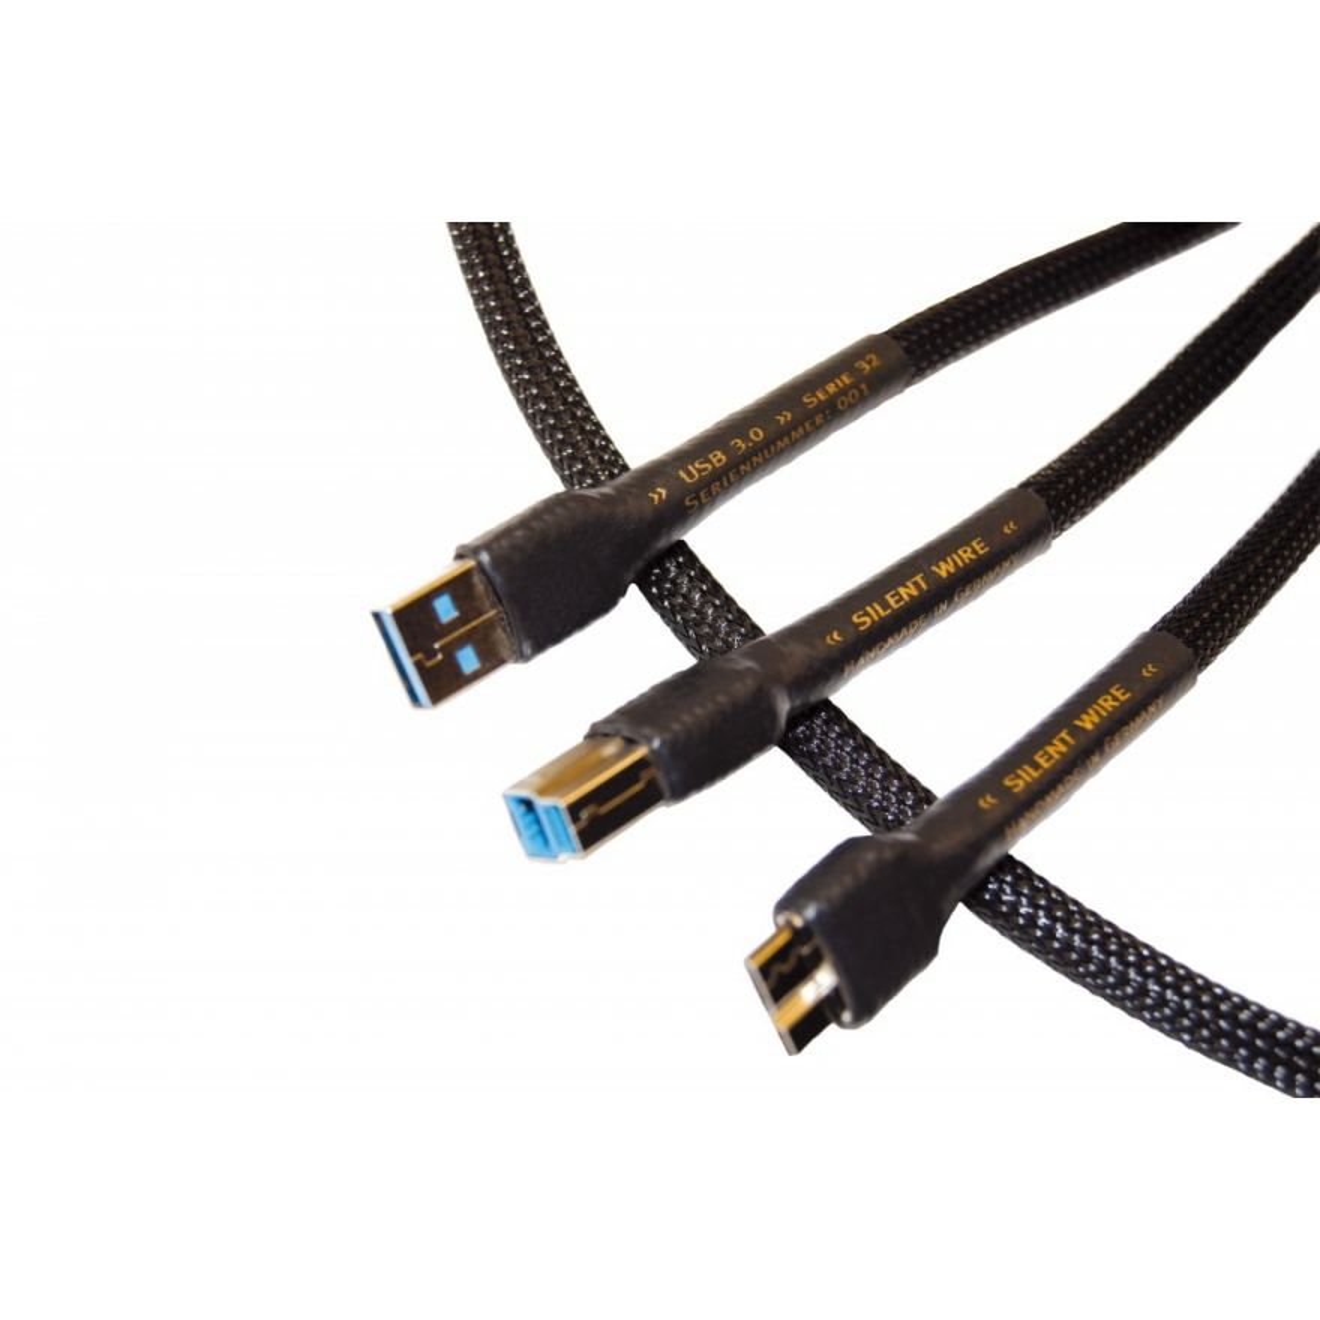 Silent Wire Serie 32 USB 3.0 Kabel, Highend-Audiokabel.de | HiFi ...